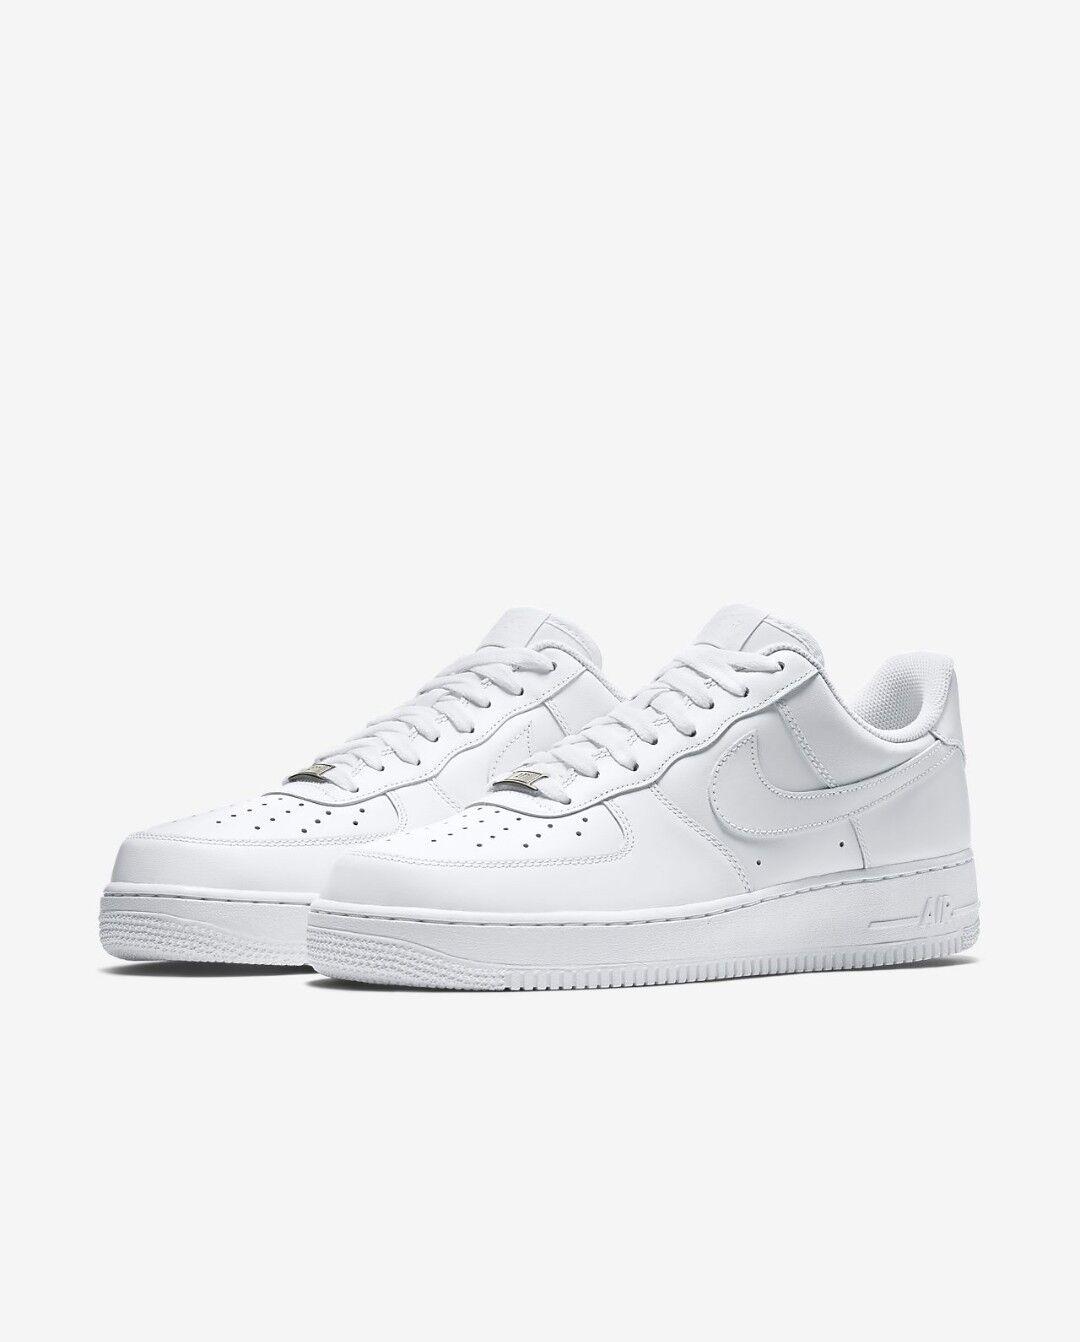 Nike air force Weiß 1 low Weiß force 47 ungetragen d94b06